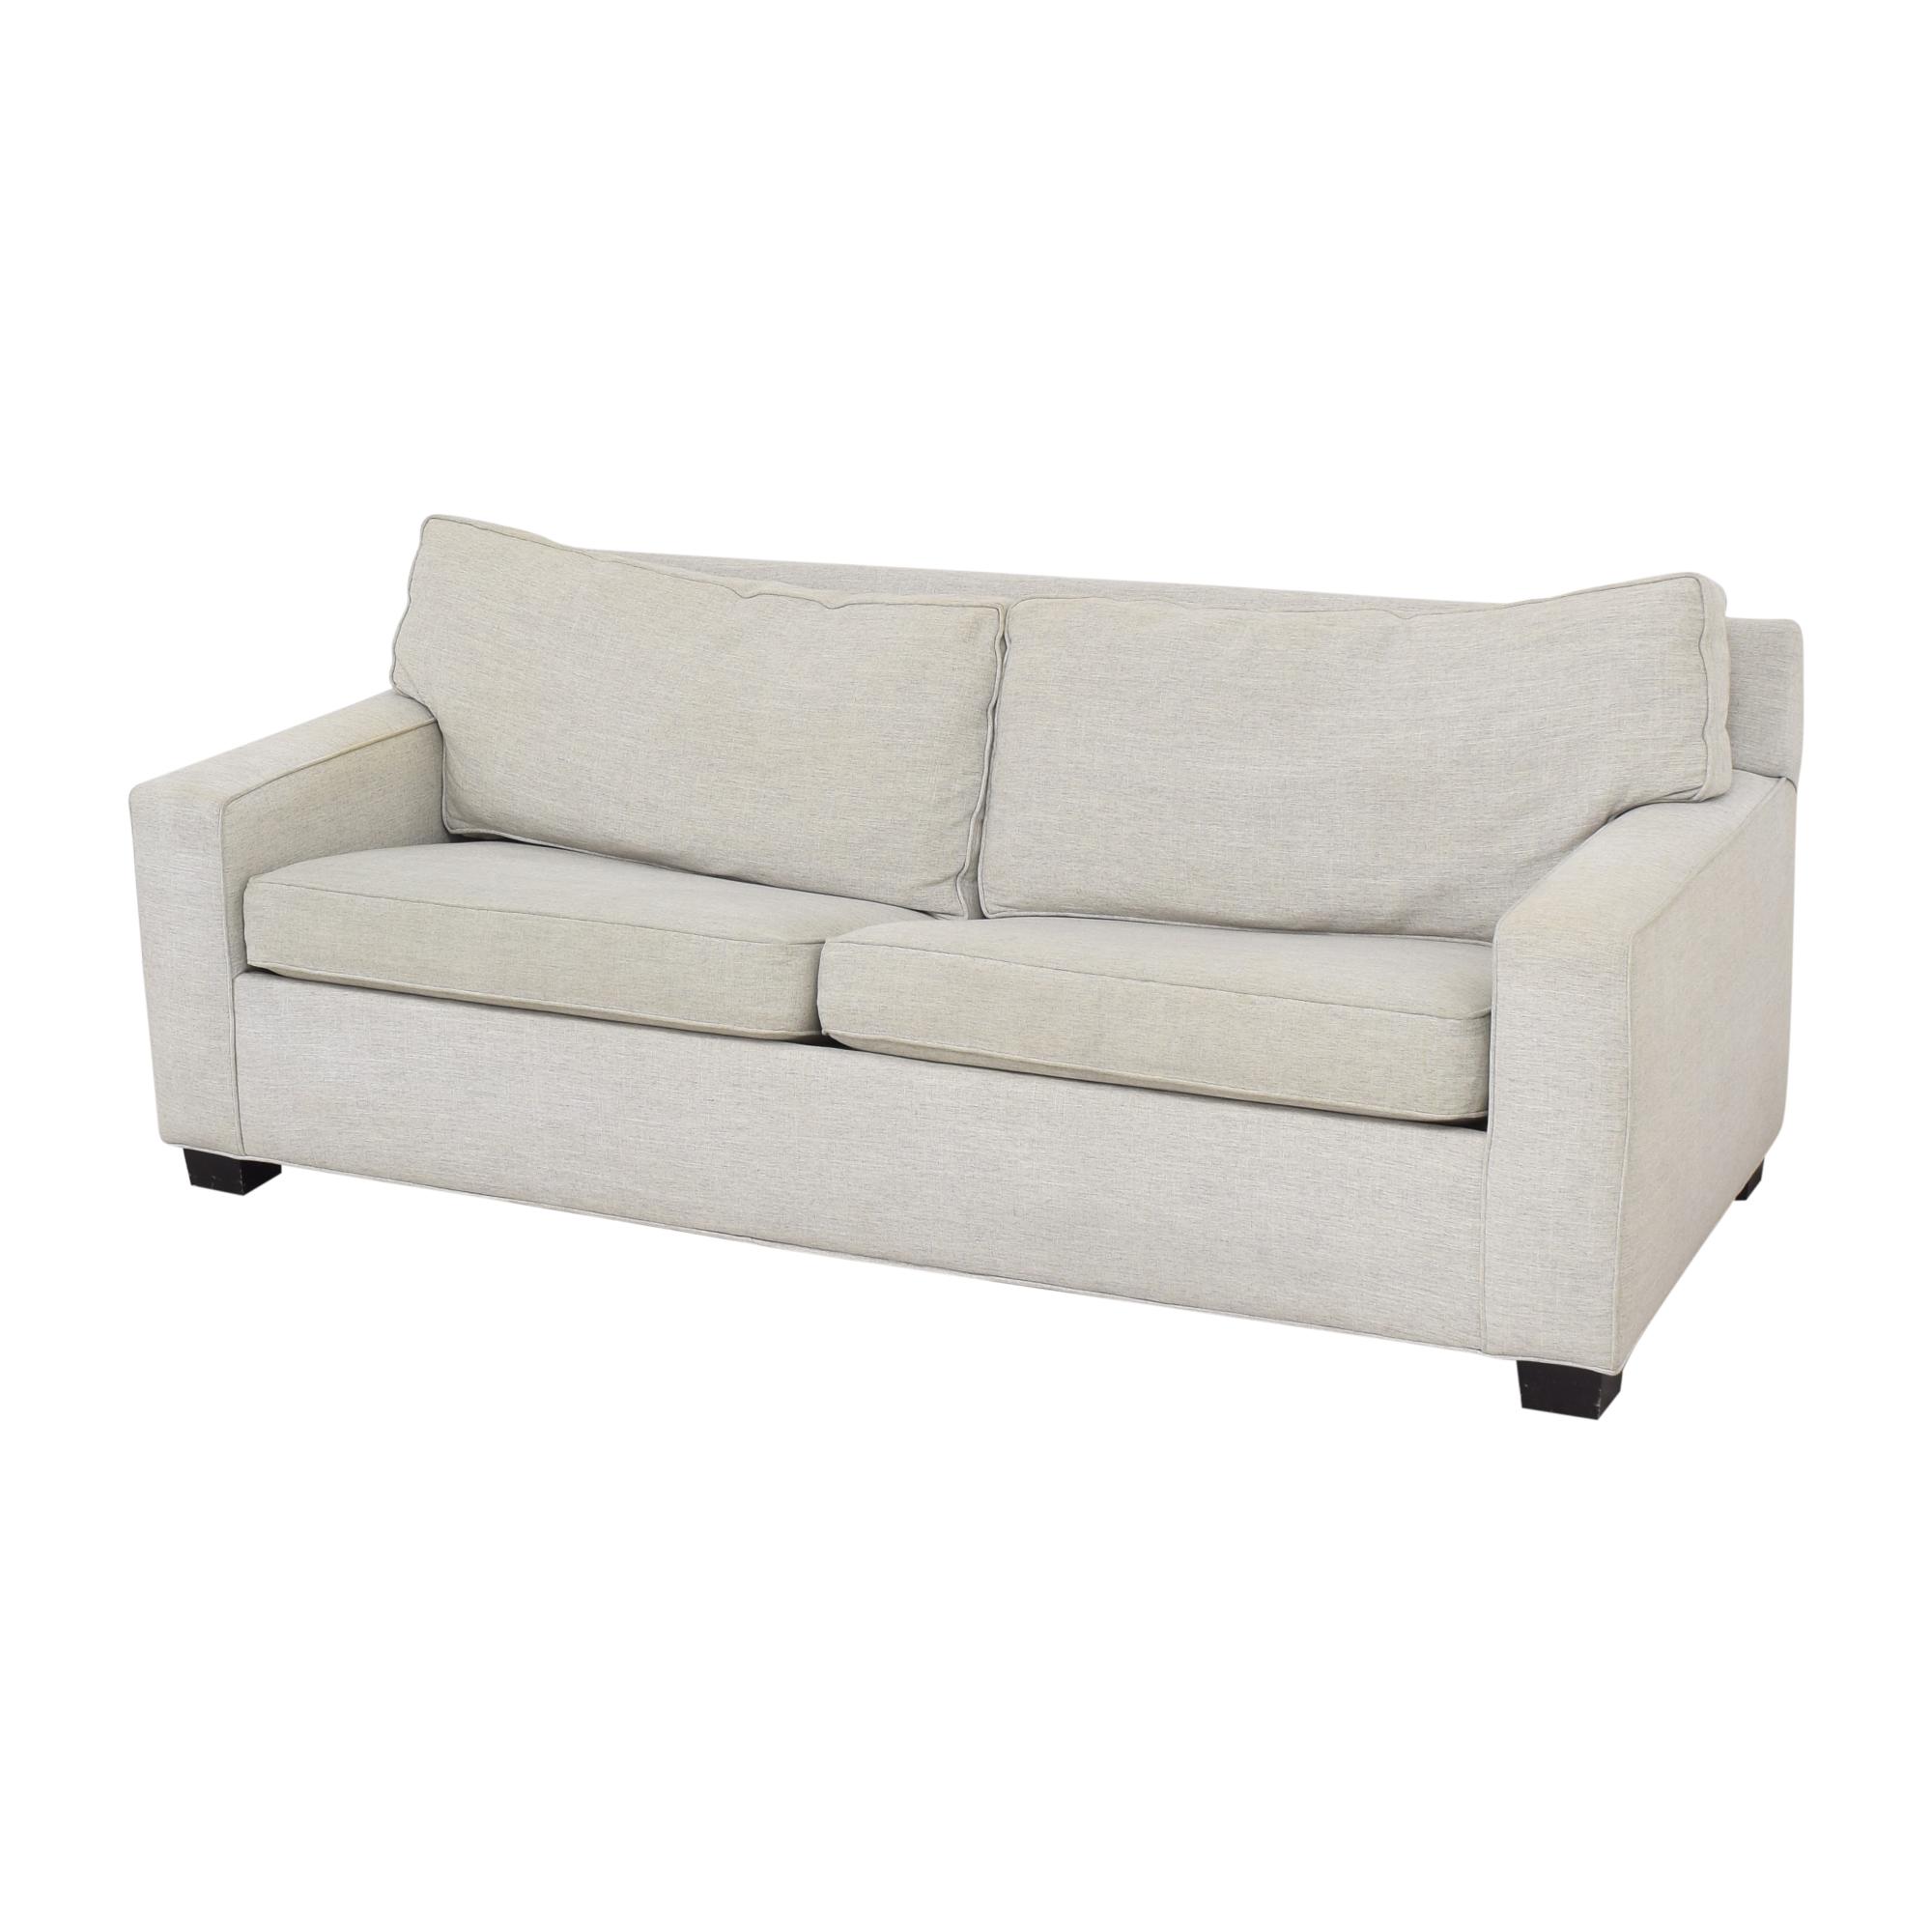 Mitchell Gold + Bob Williams Alex Queen Sleeper Sofa sale